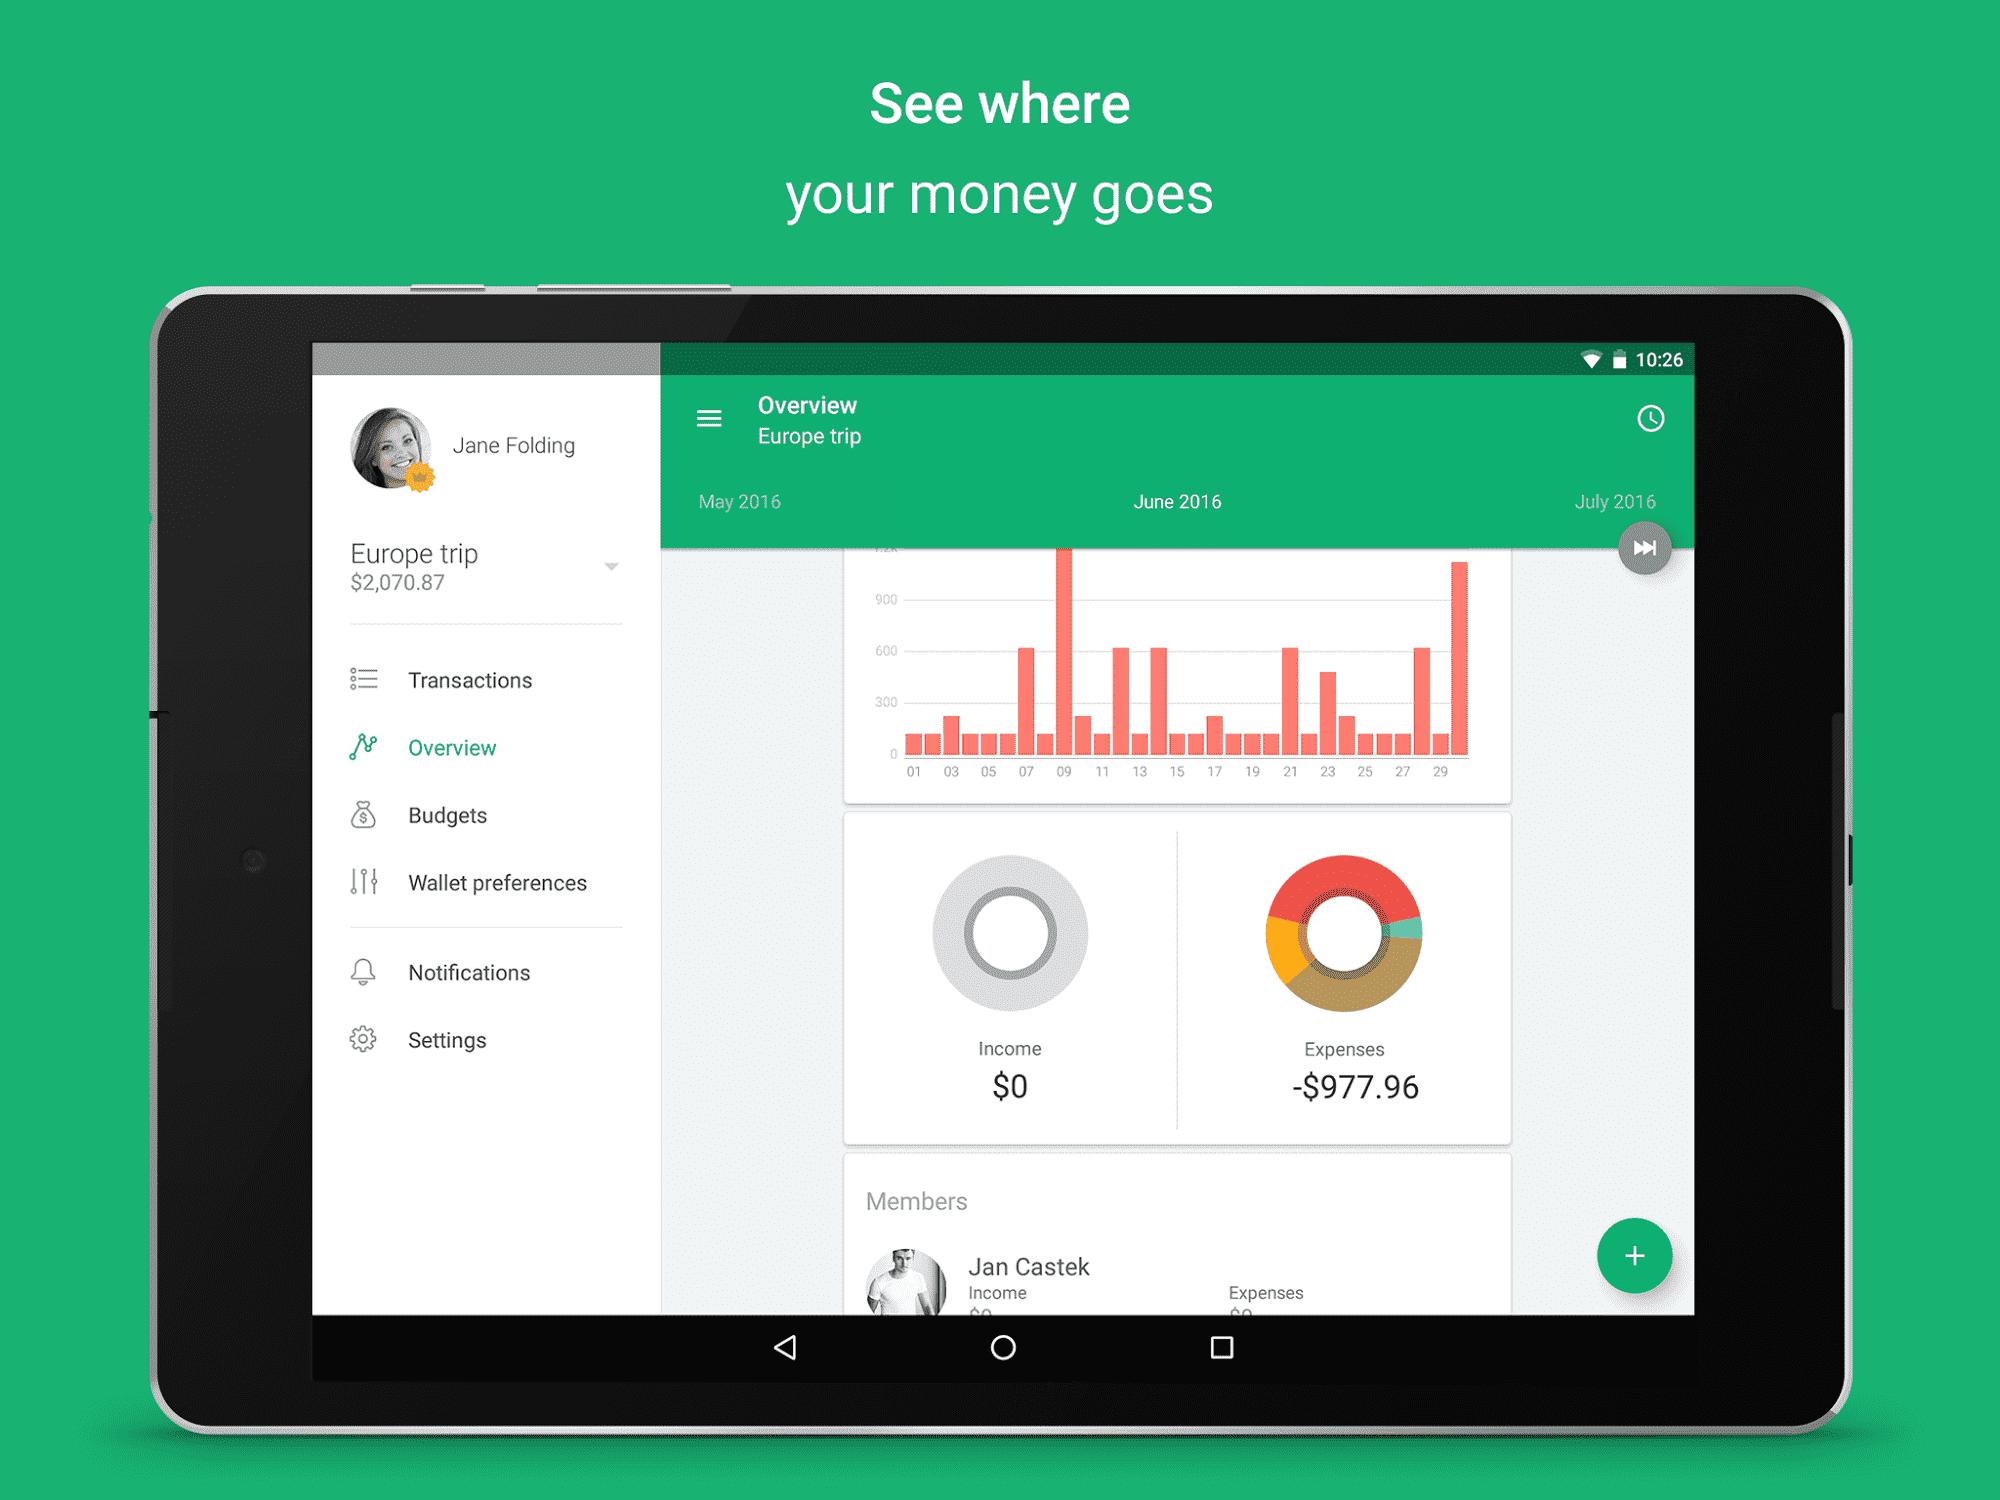 us android 6 spendee Путь к экономии со Spendee. Подробный обзор приложения Spendee для Андроид.